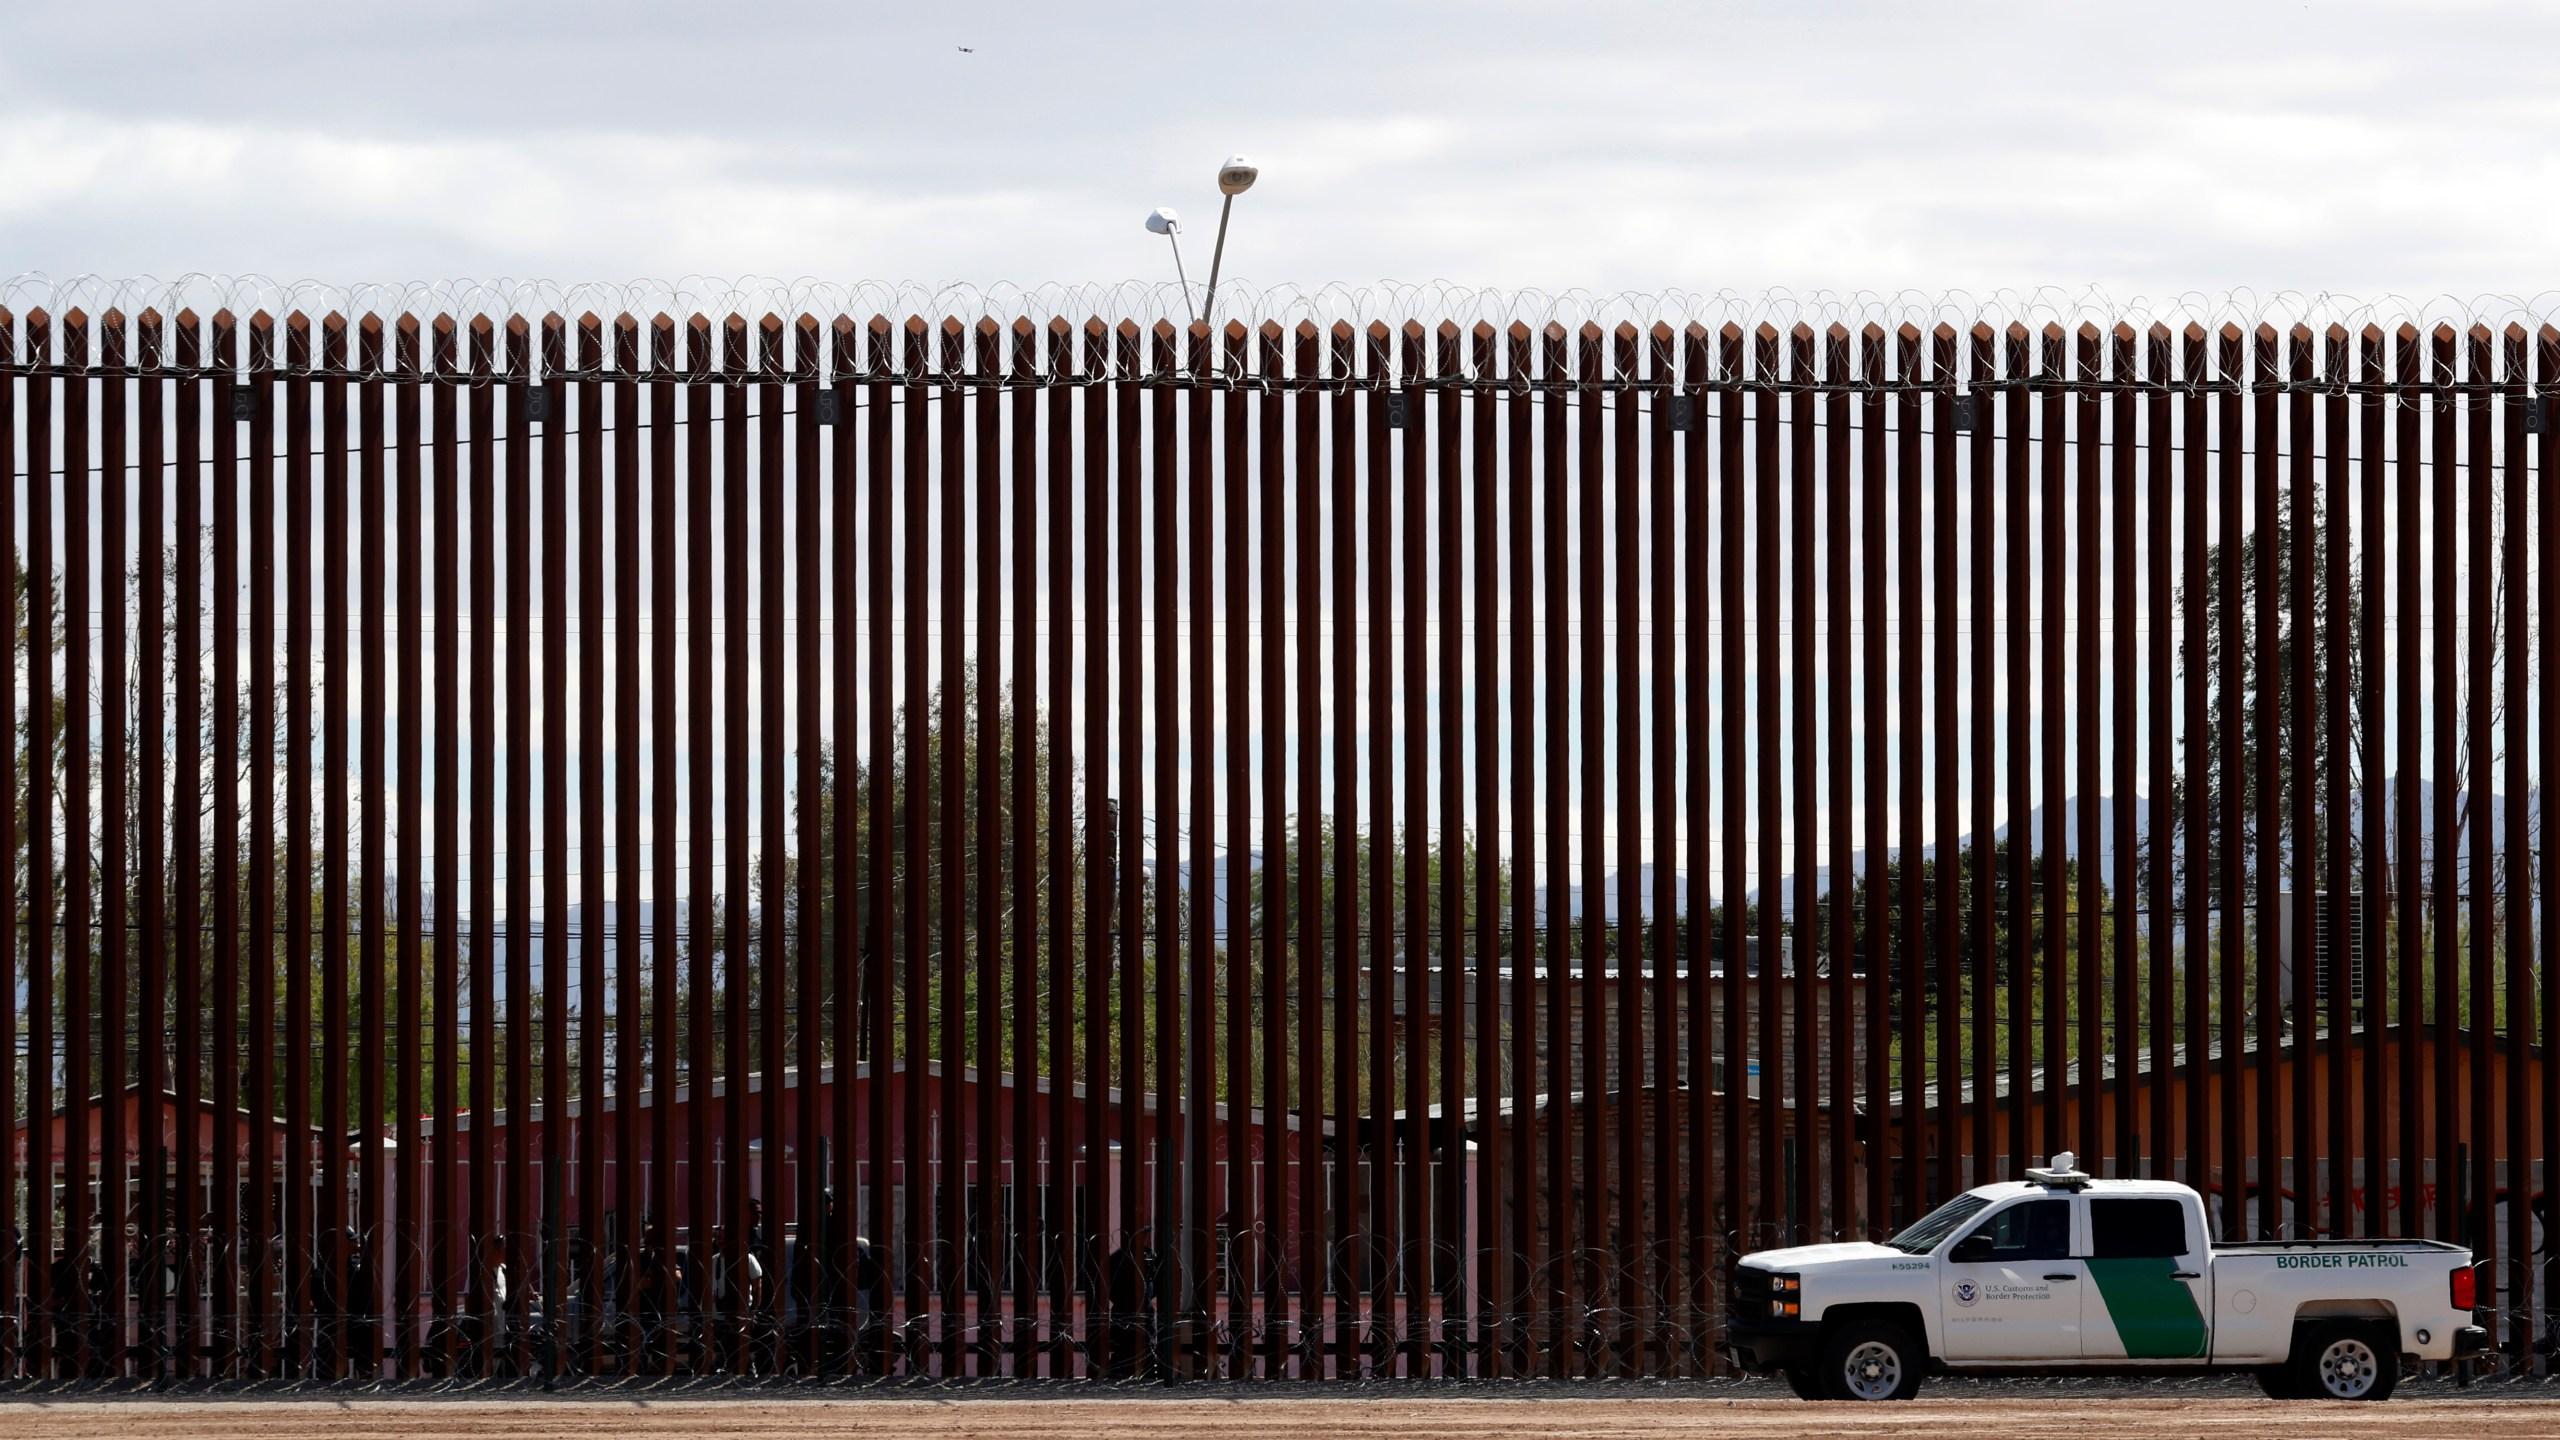 Congress_Border_Wall_31641-159532.jpg20132097